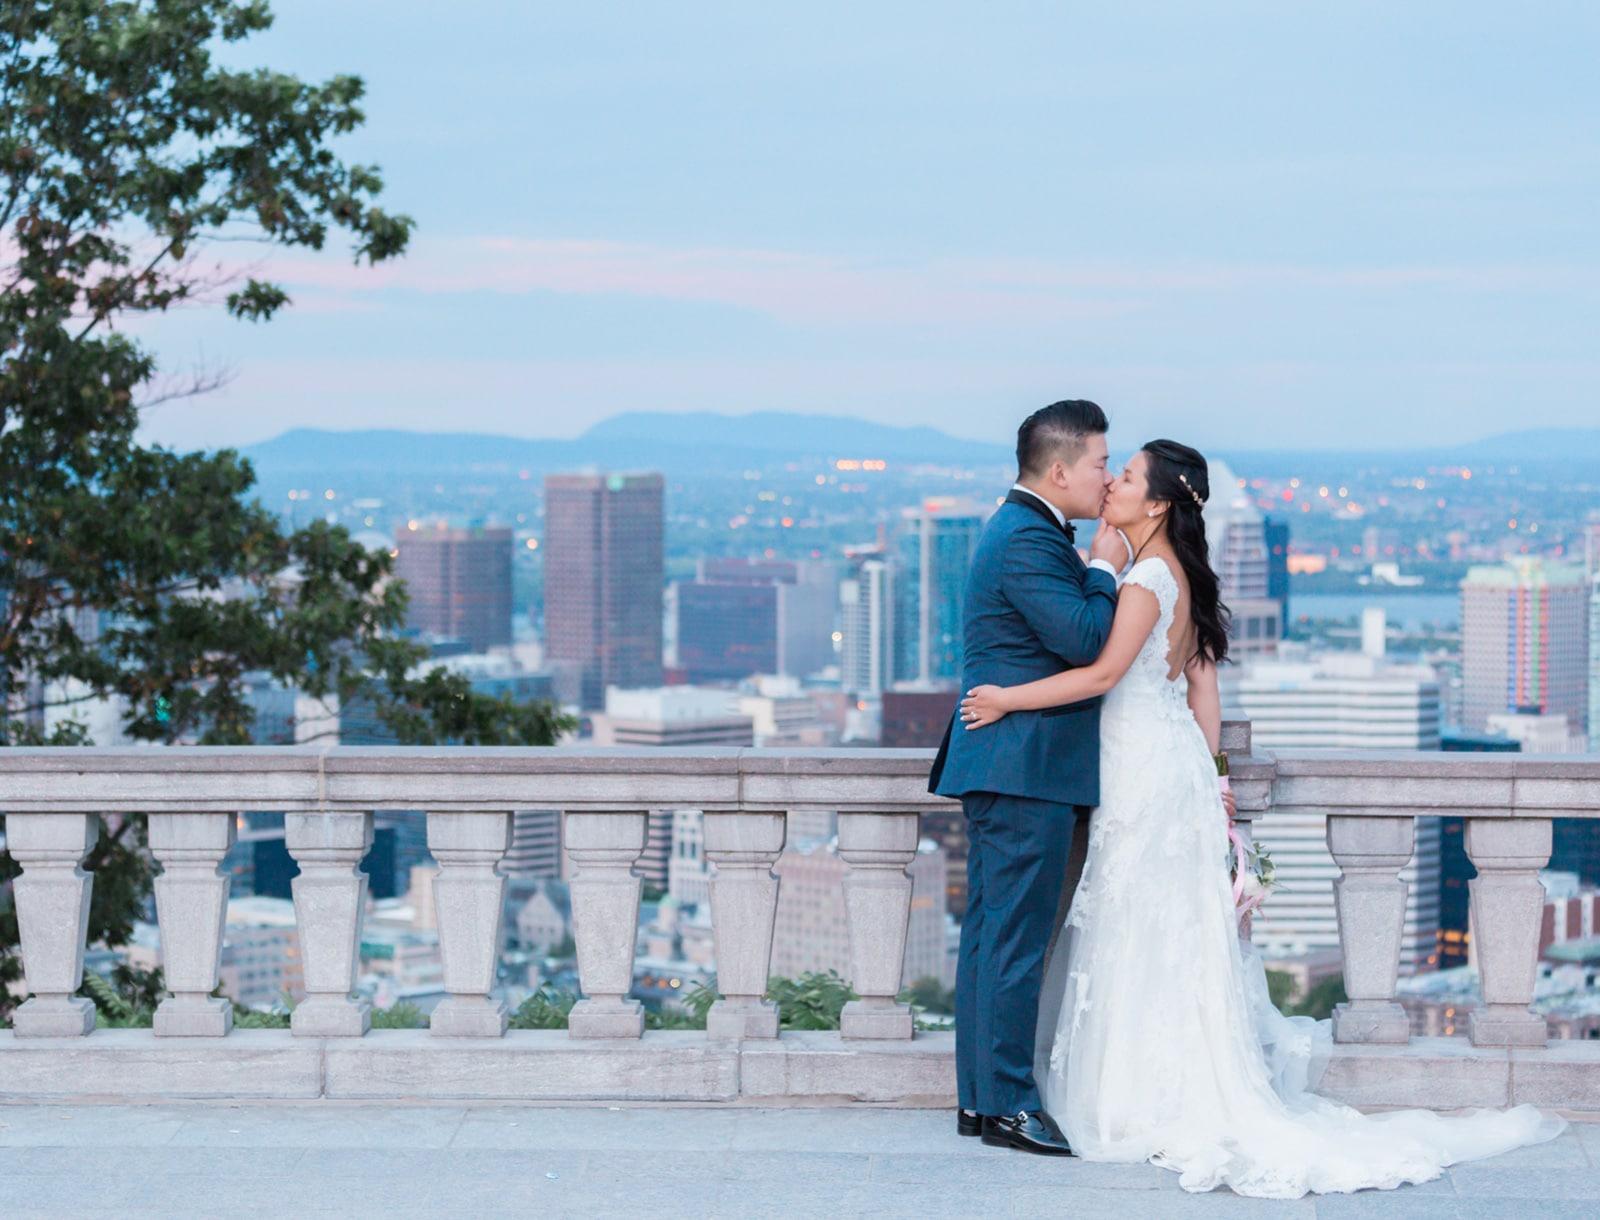 Montreal Post-Wedding Session at Chalet du Mont Royal: Si Hua + Ga-Fye